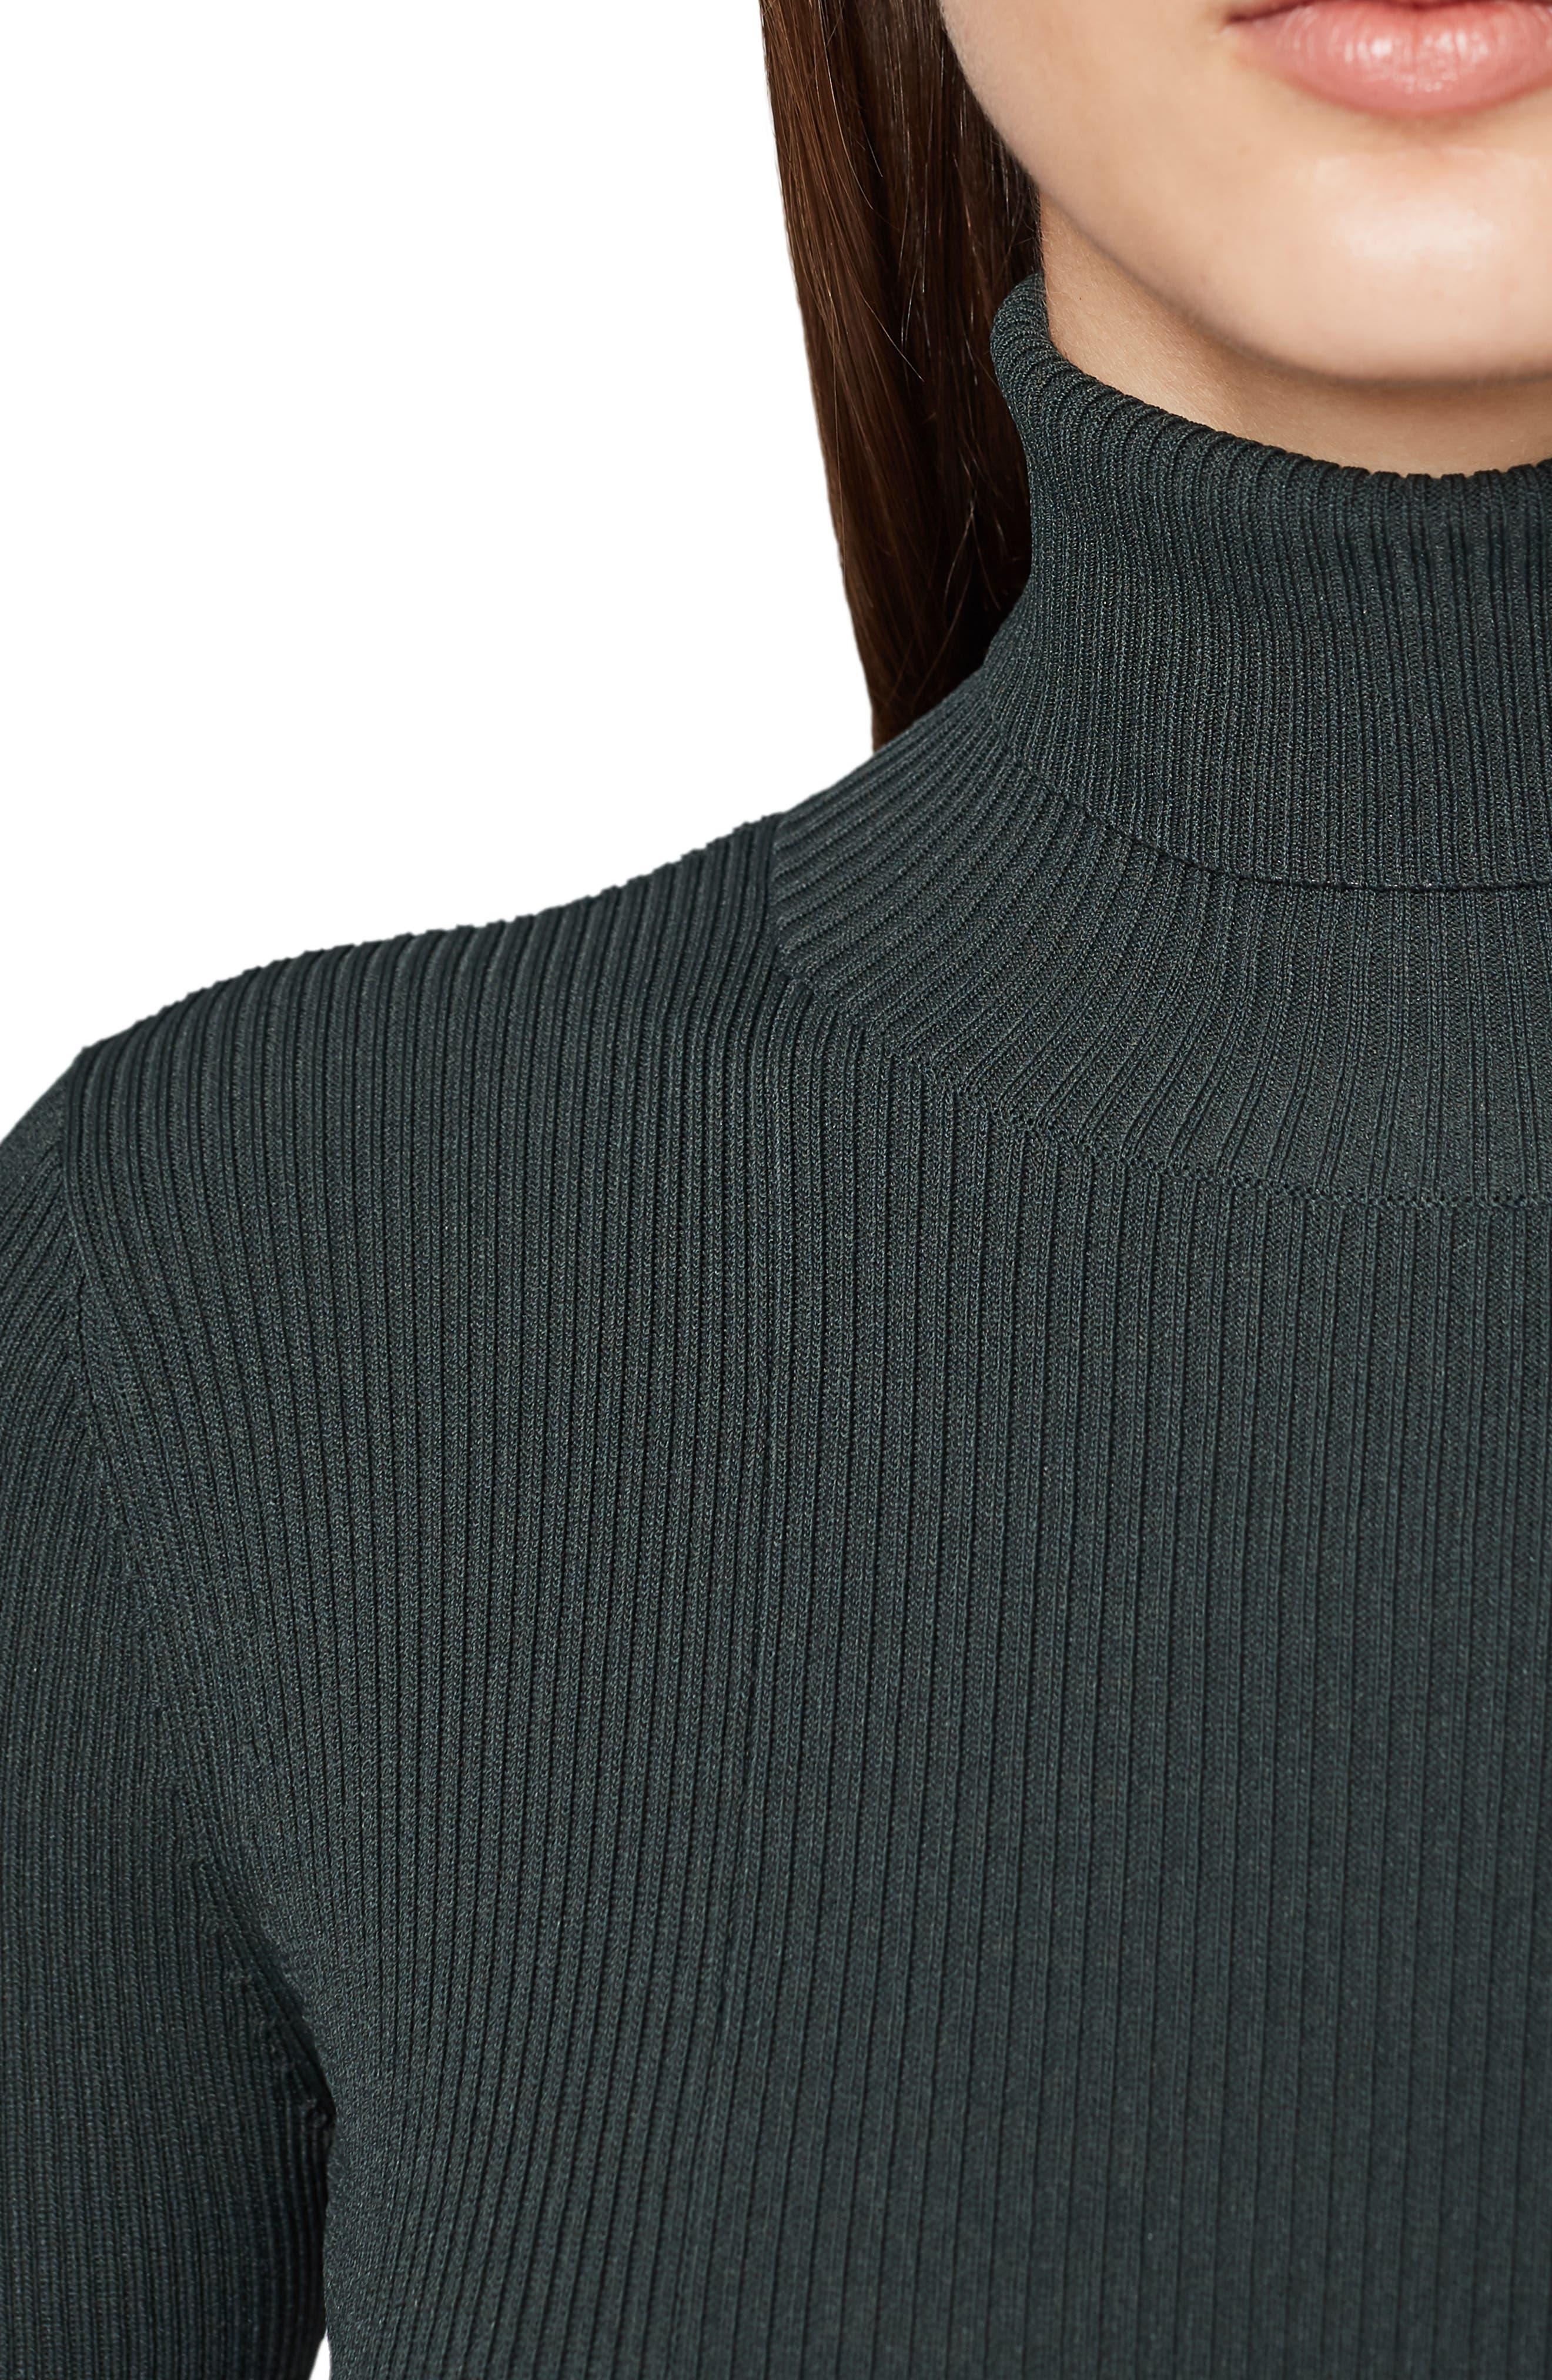 REISS,                             Mimi Turtleneck Sweater Dress,                             Alternate thumbnail 3, color,                             GREEN